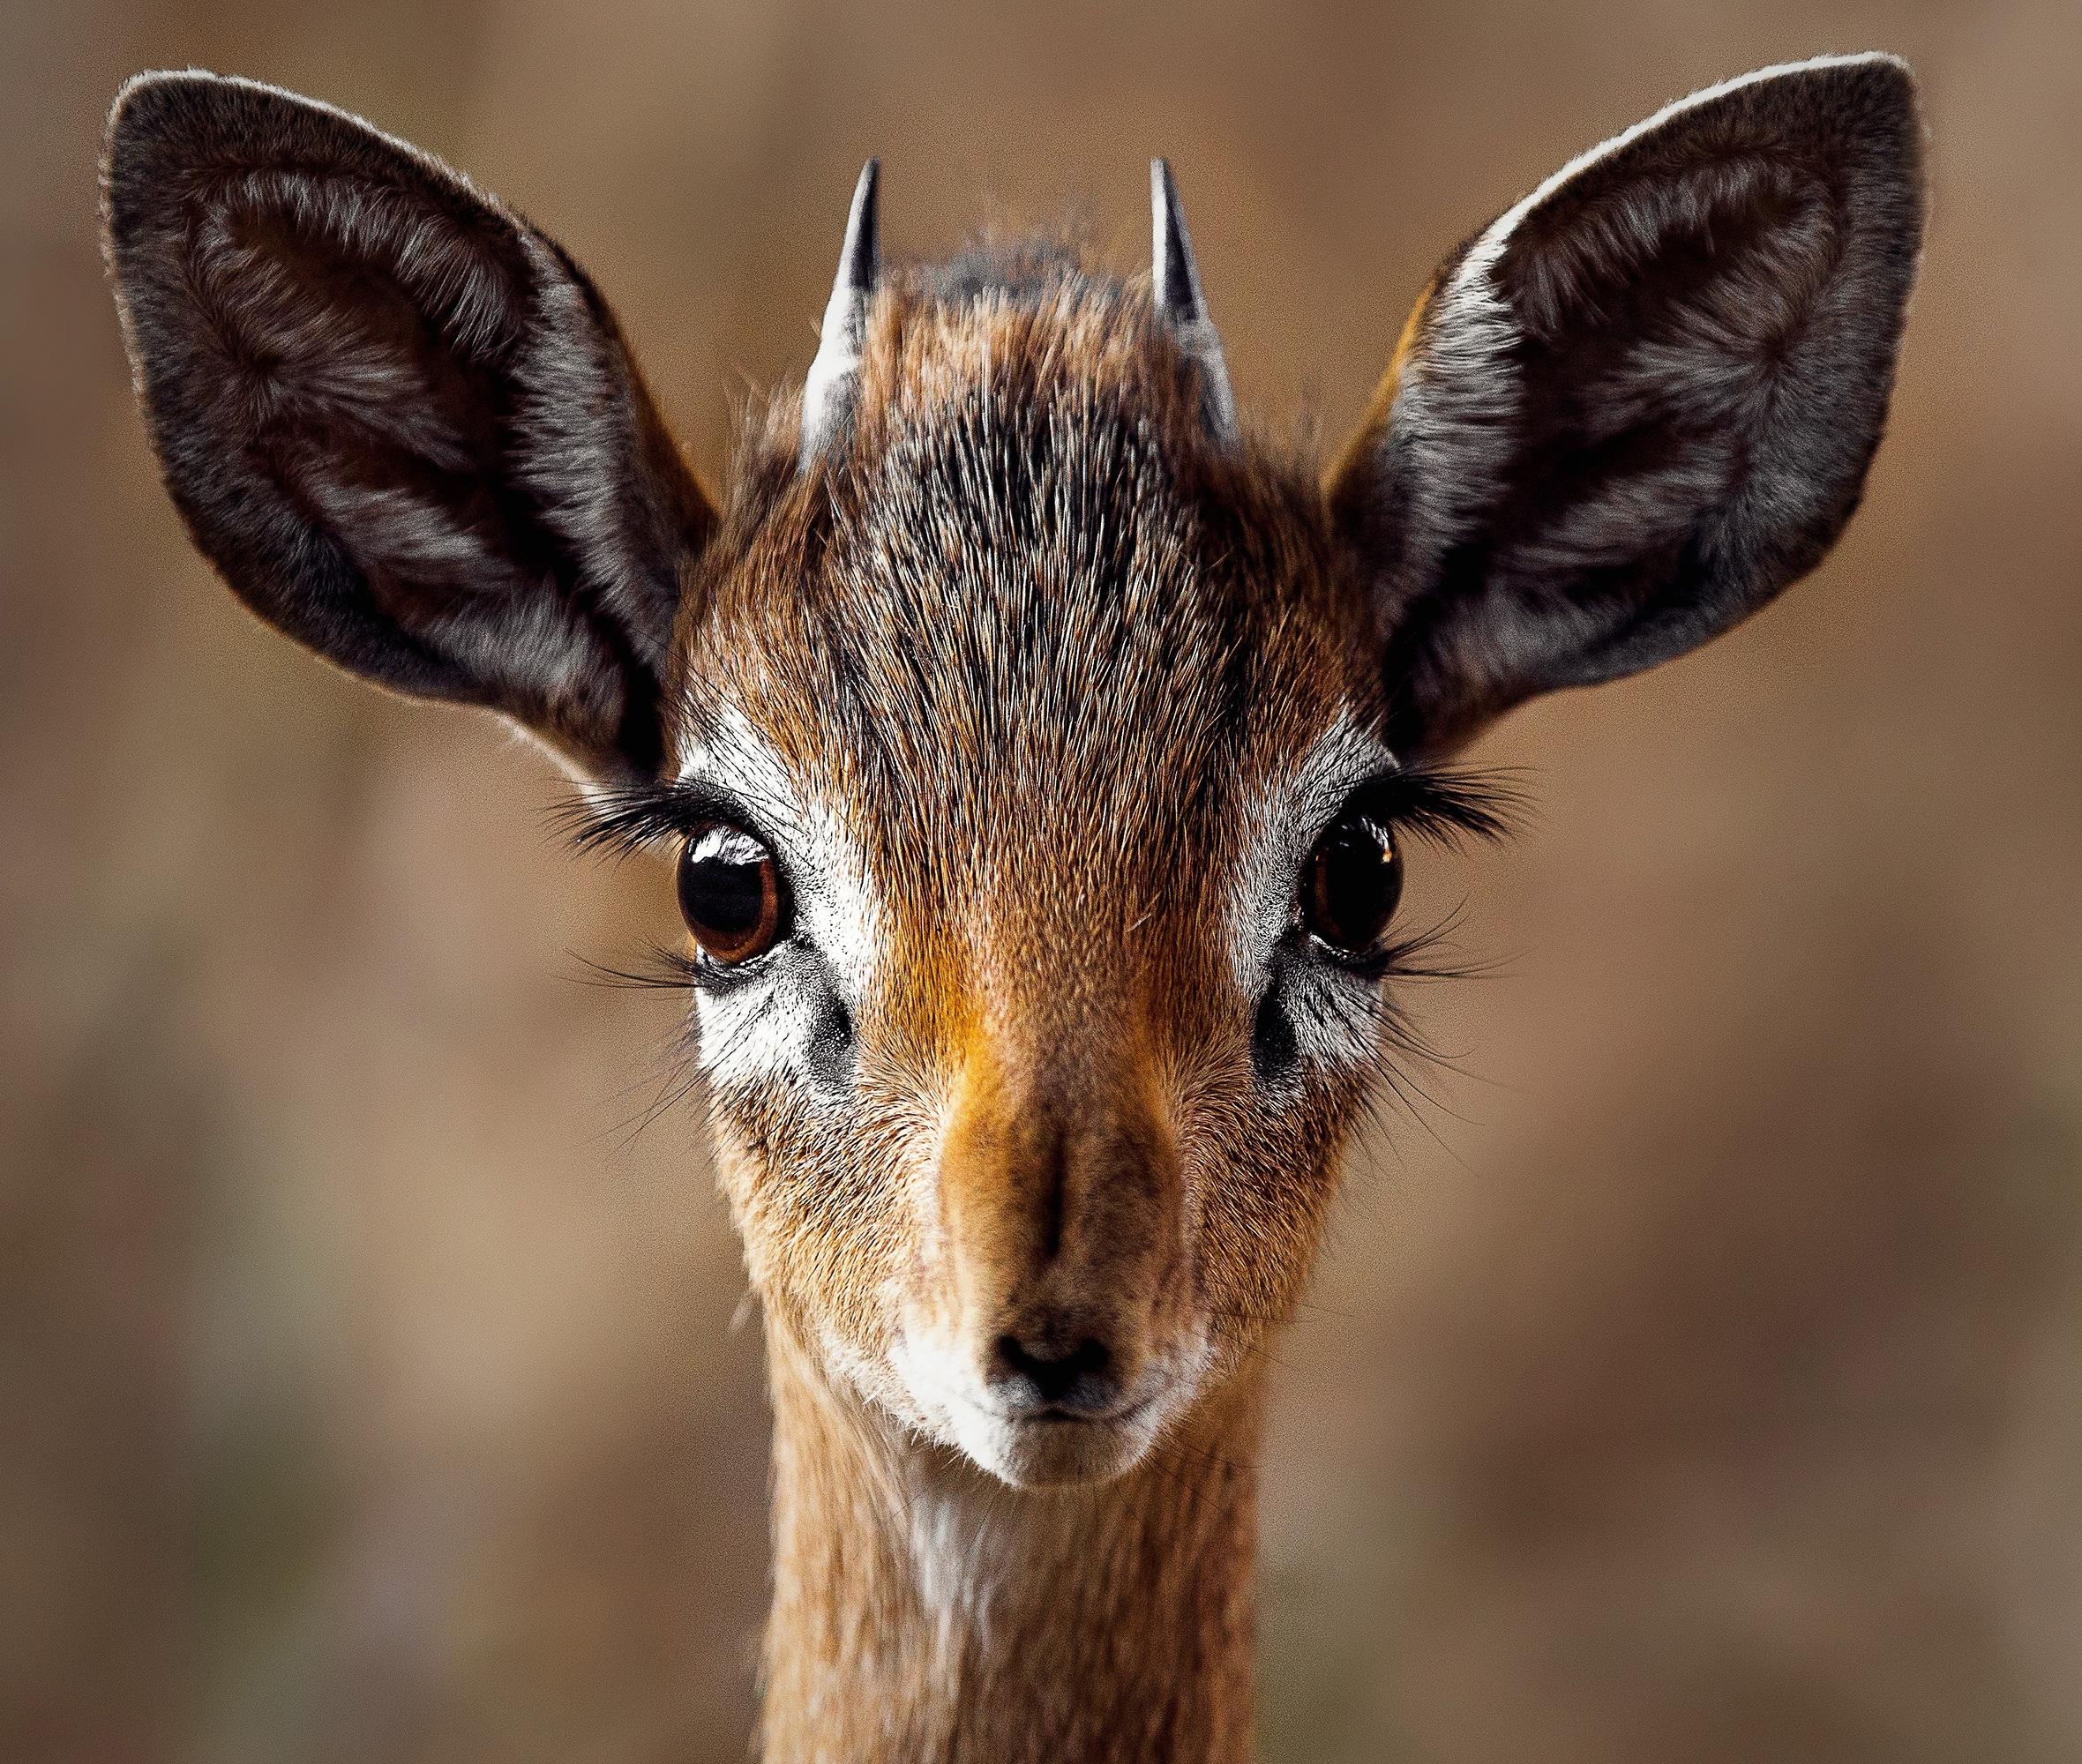 Free Images : nature, animal, wildlife, horn, portrait ...